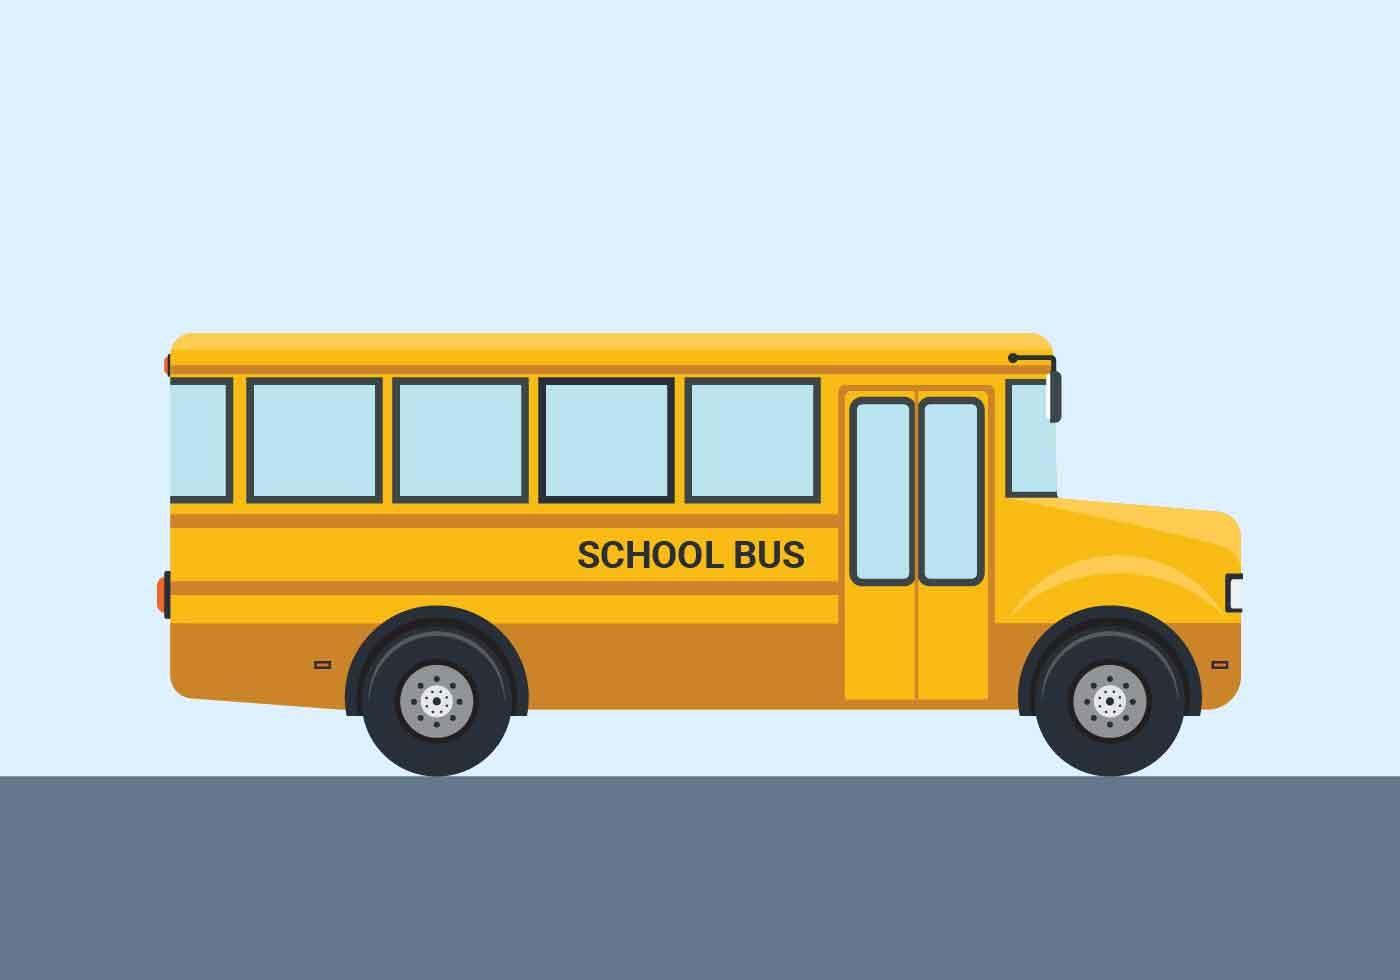 School Bus Vector Illustration - Download Free Vectors ...